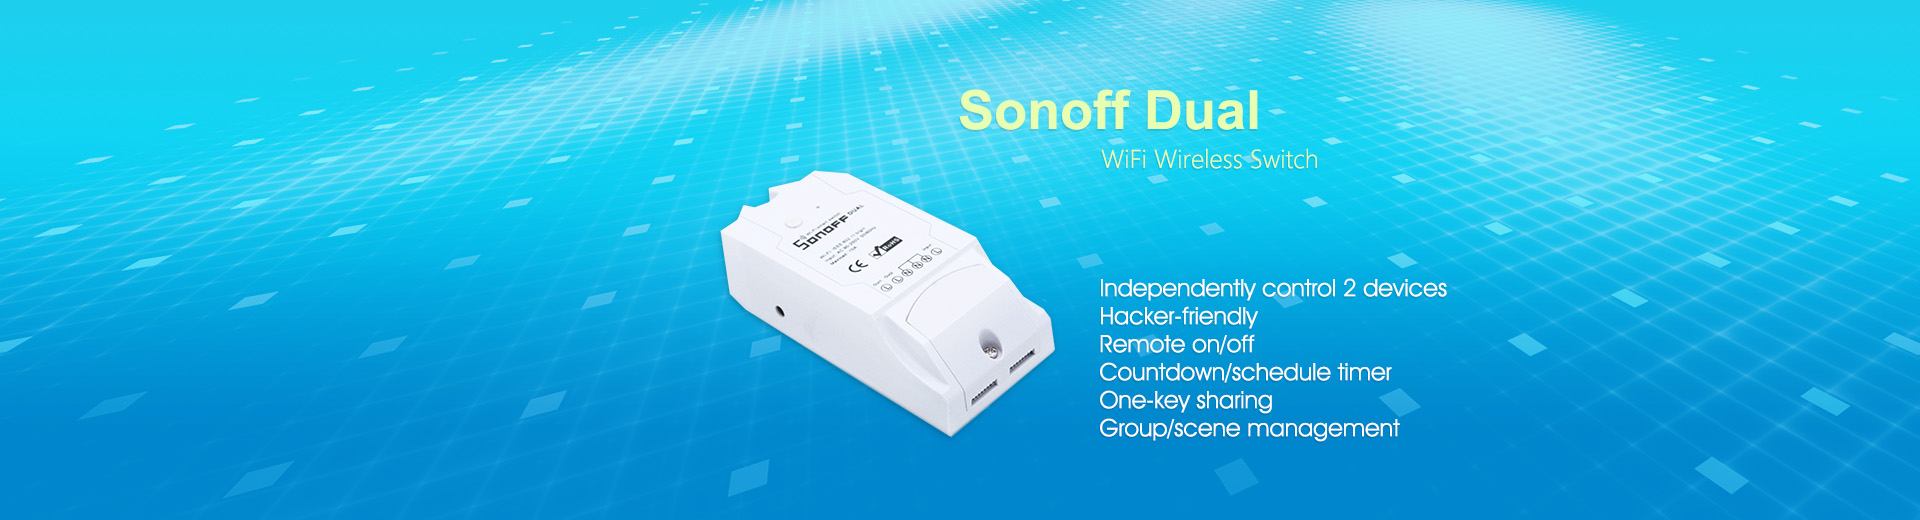 Sonoff Dual